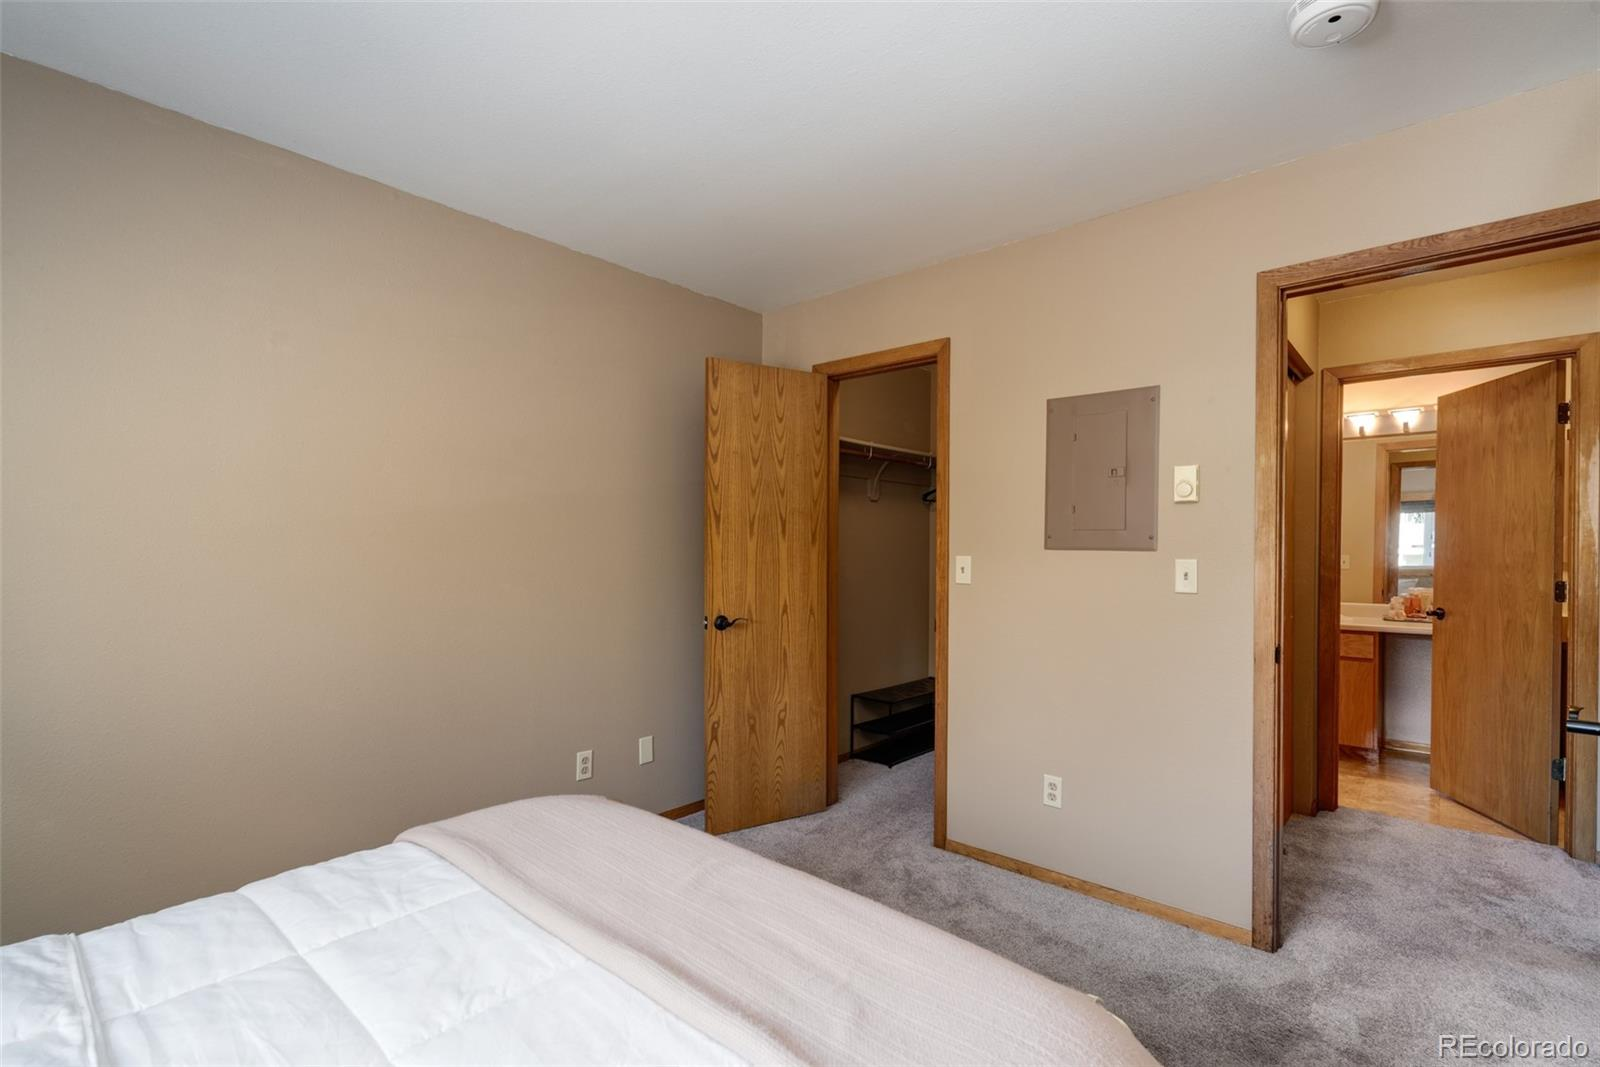 MLS# 5816259 - 11 - 1385 Sparta Plaza #7, Steamboat Springs, CO 80487